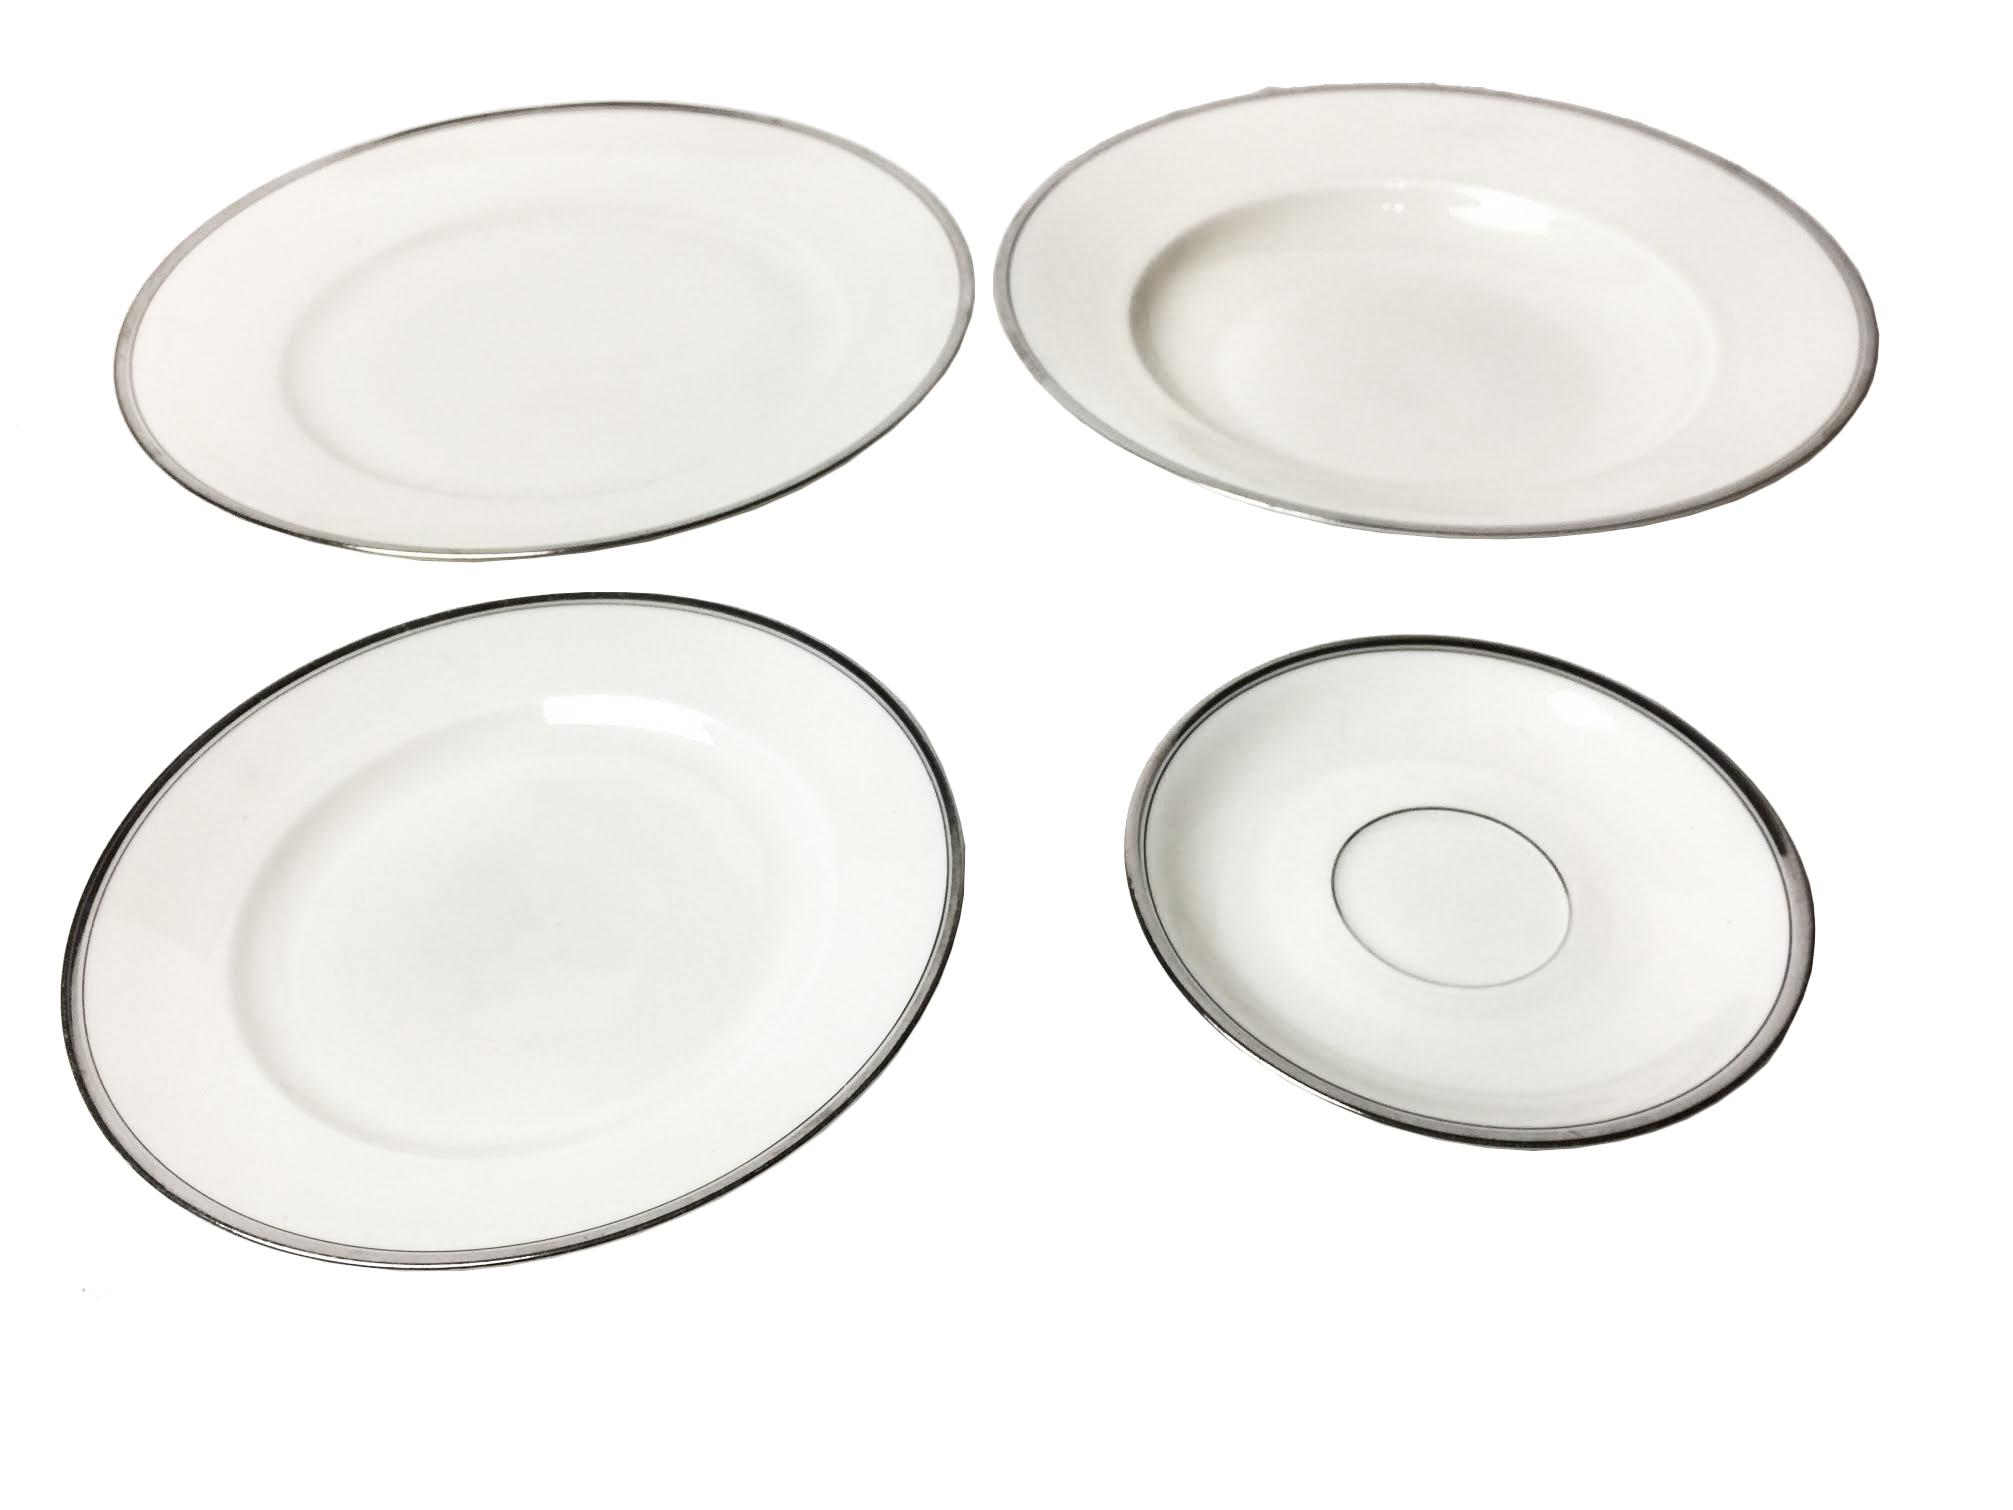 1920s Vintage Art Deco Style White \u0026 Silver Dinnerware Set - 22 Pieces - Image 3  sc 1 st  Chairish & 1920s Vintage Art Deco Style White \u0026 Silver Dinnerware Set - 22 ...